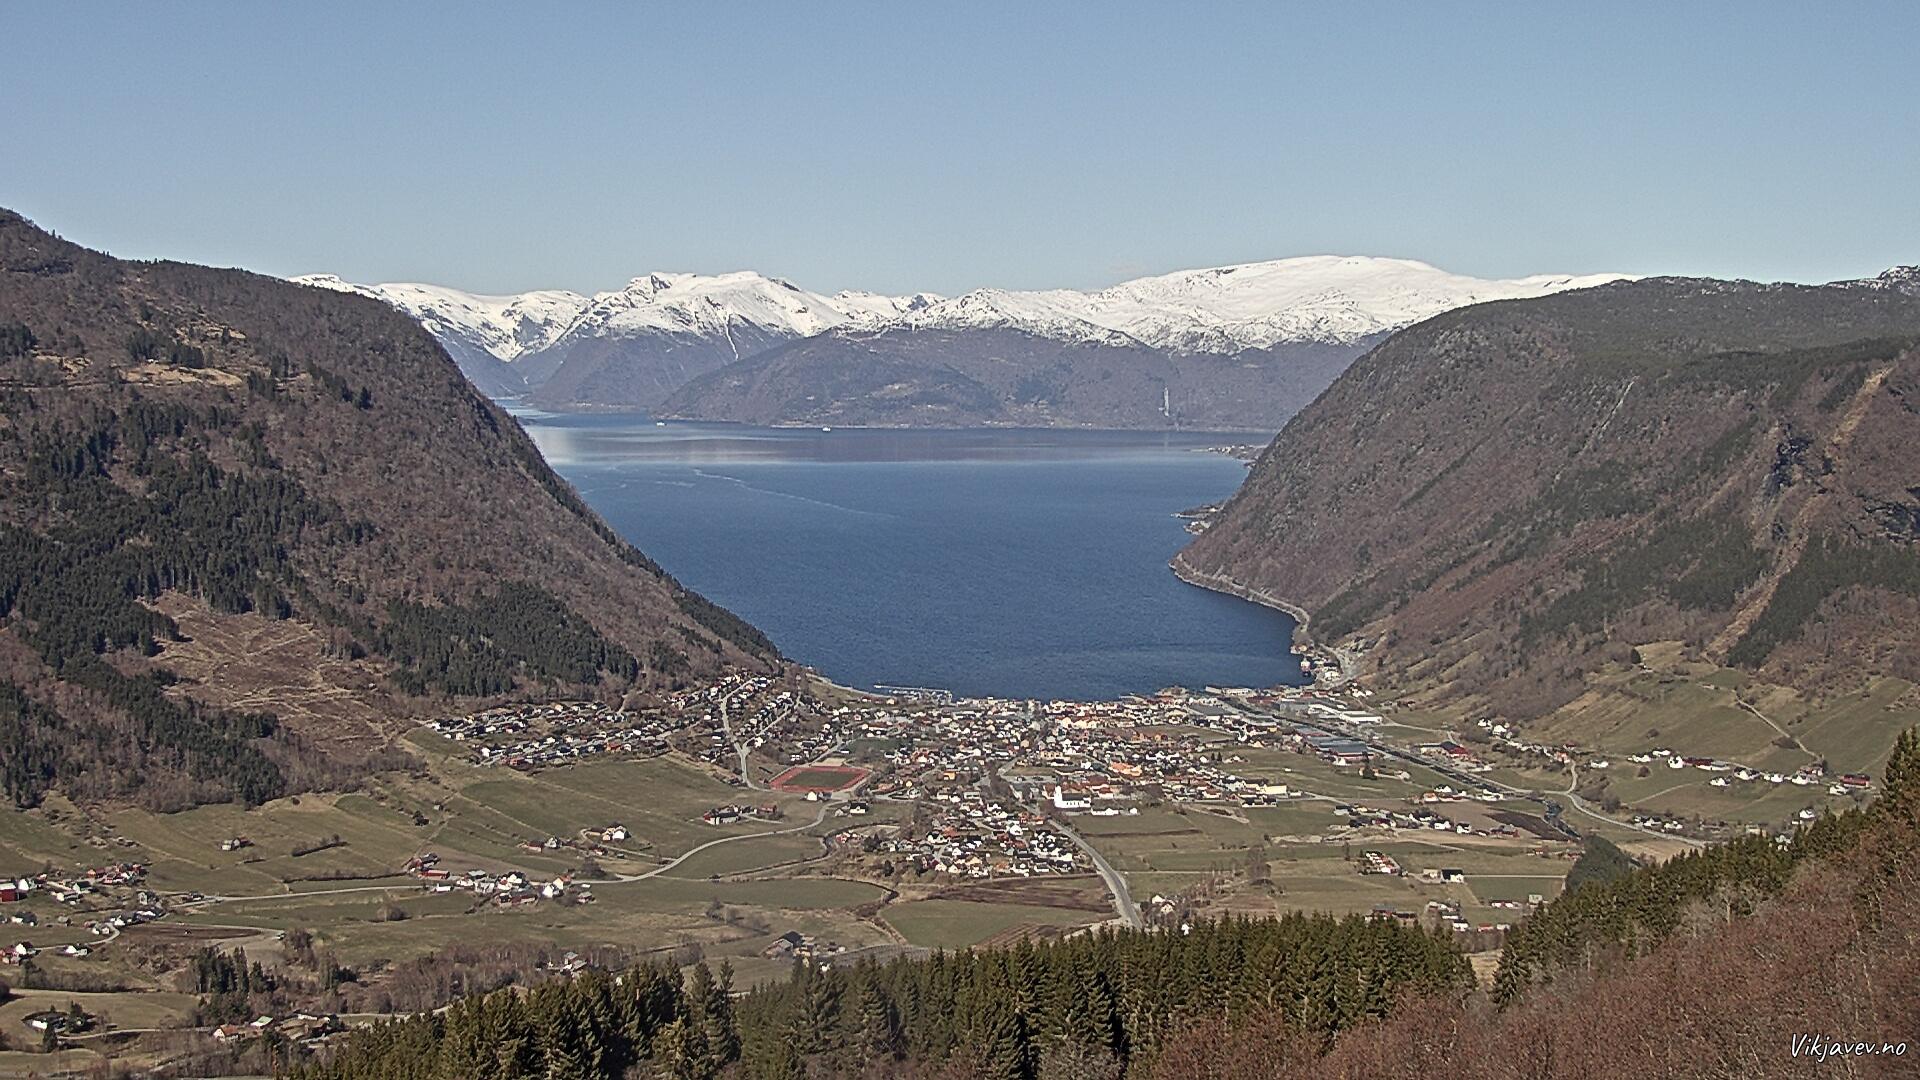 Vik i Sogn April 9, 2019 15:00